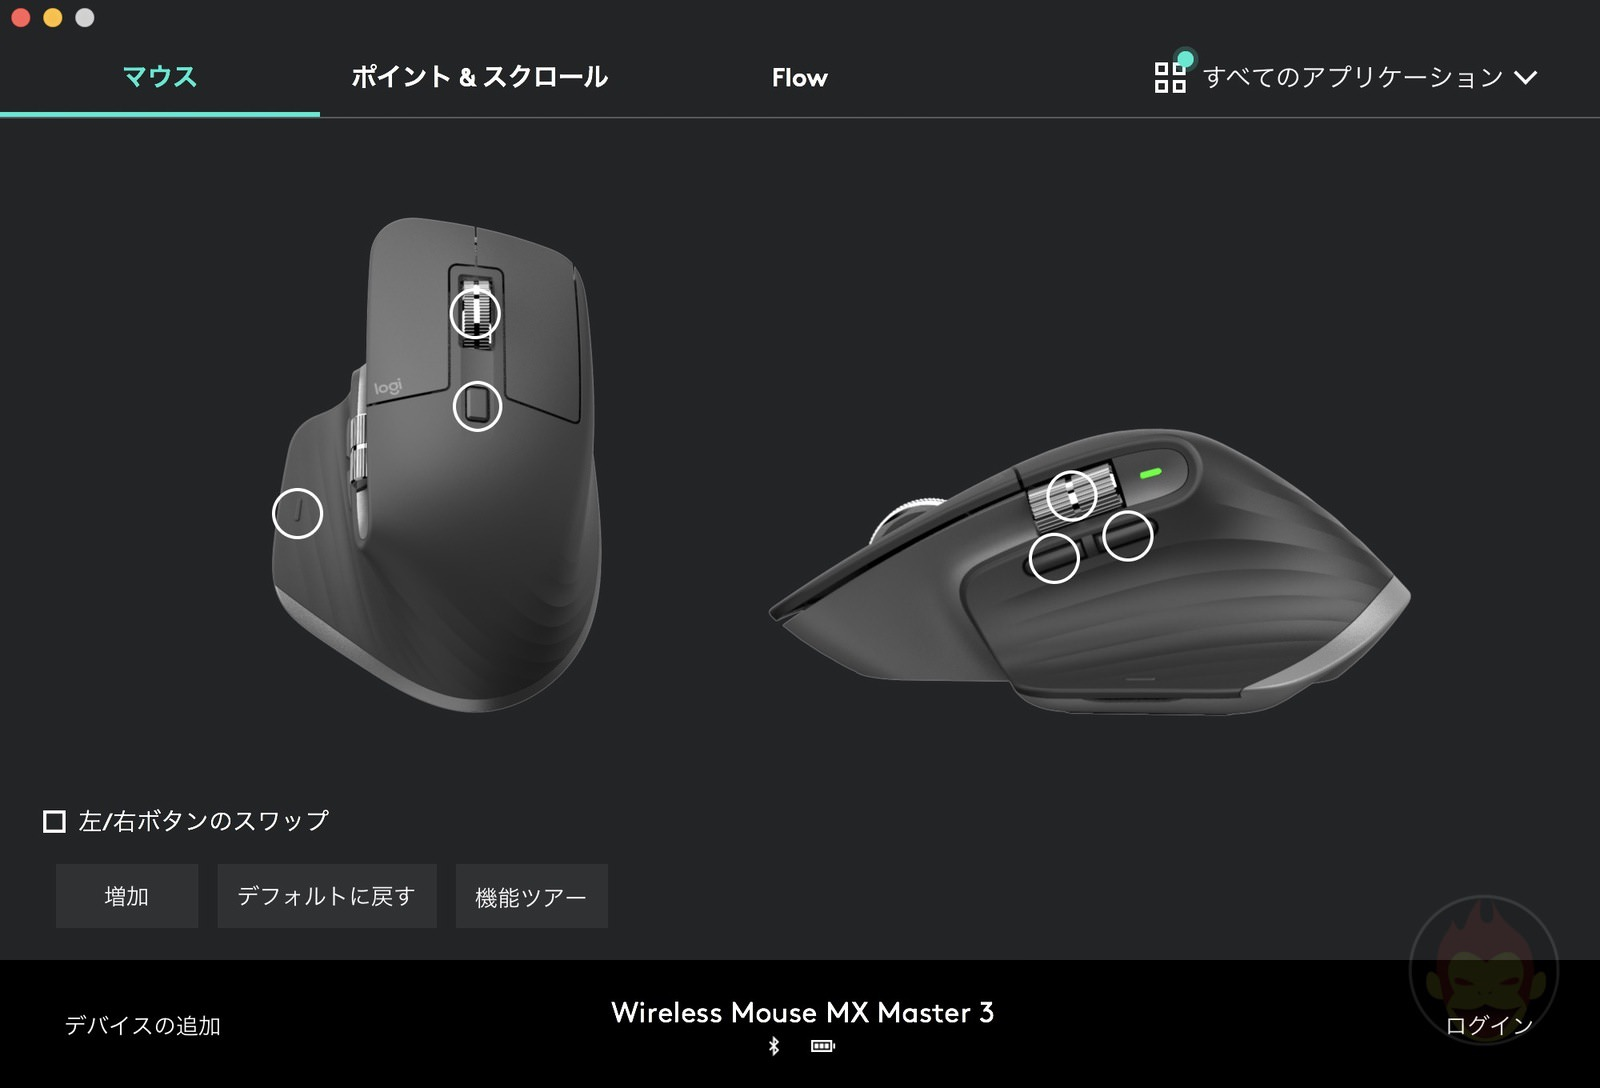 Logi-Options-MX-Master-3-02.jpg